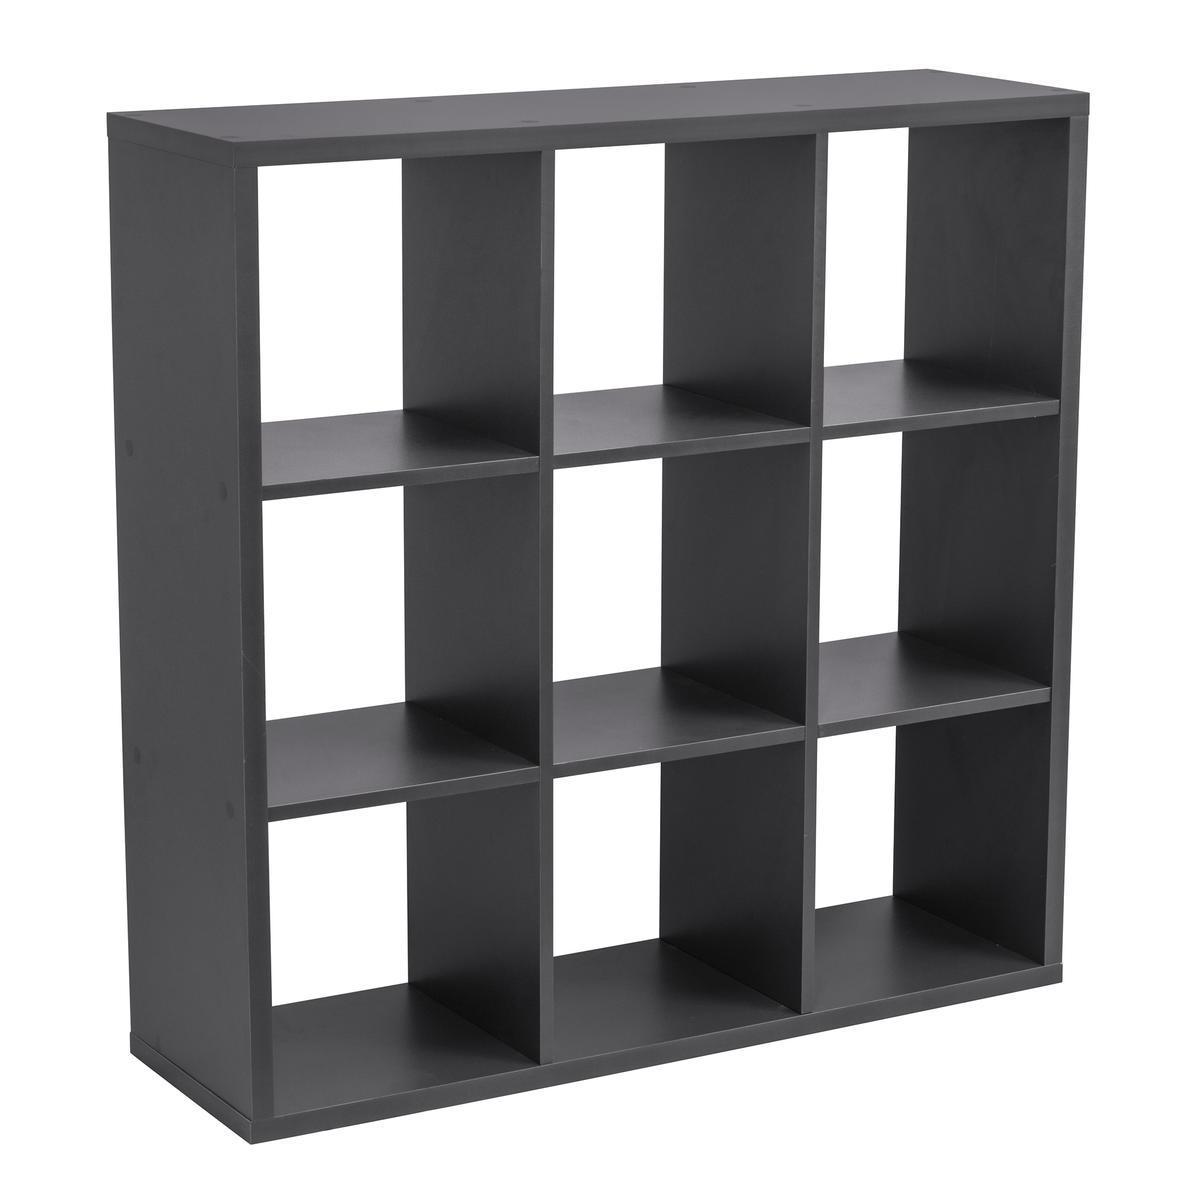 etagere cube 9 cases 97 2 x 30 x h 97